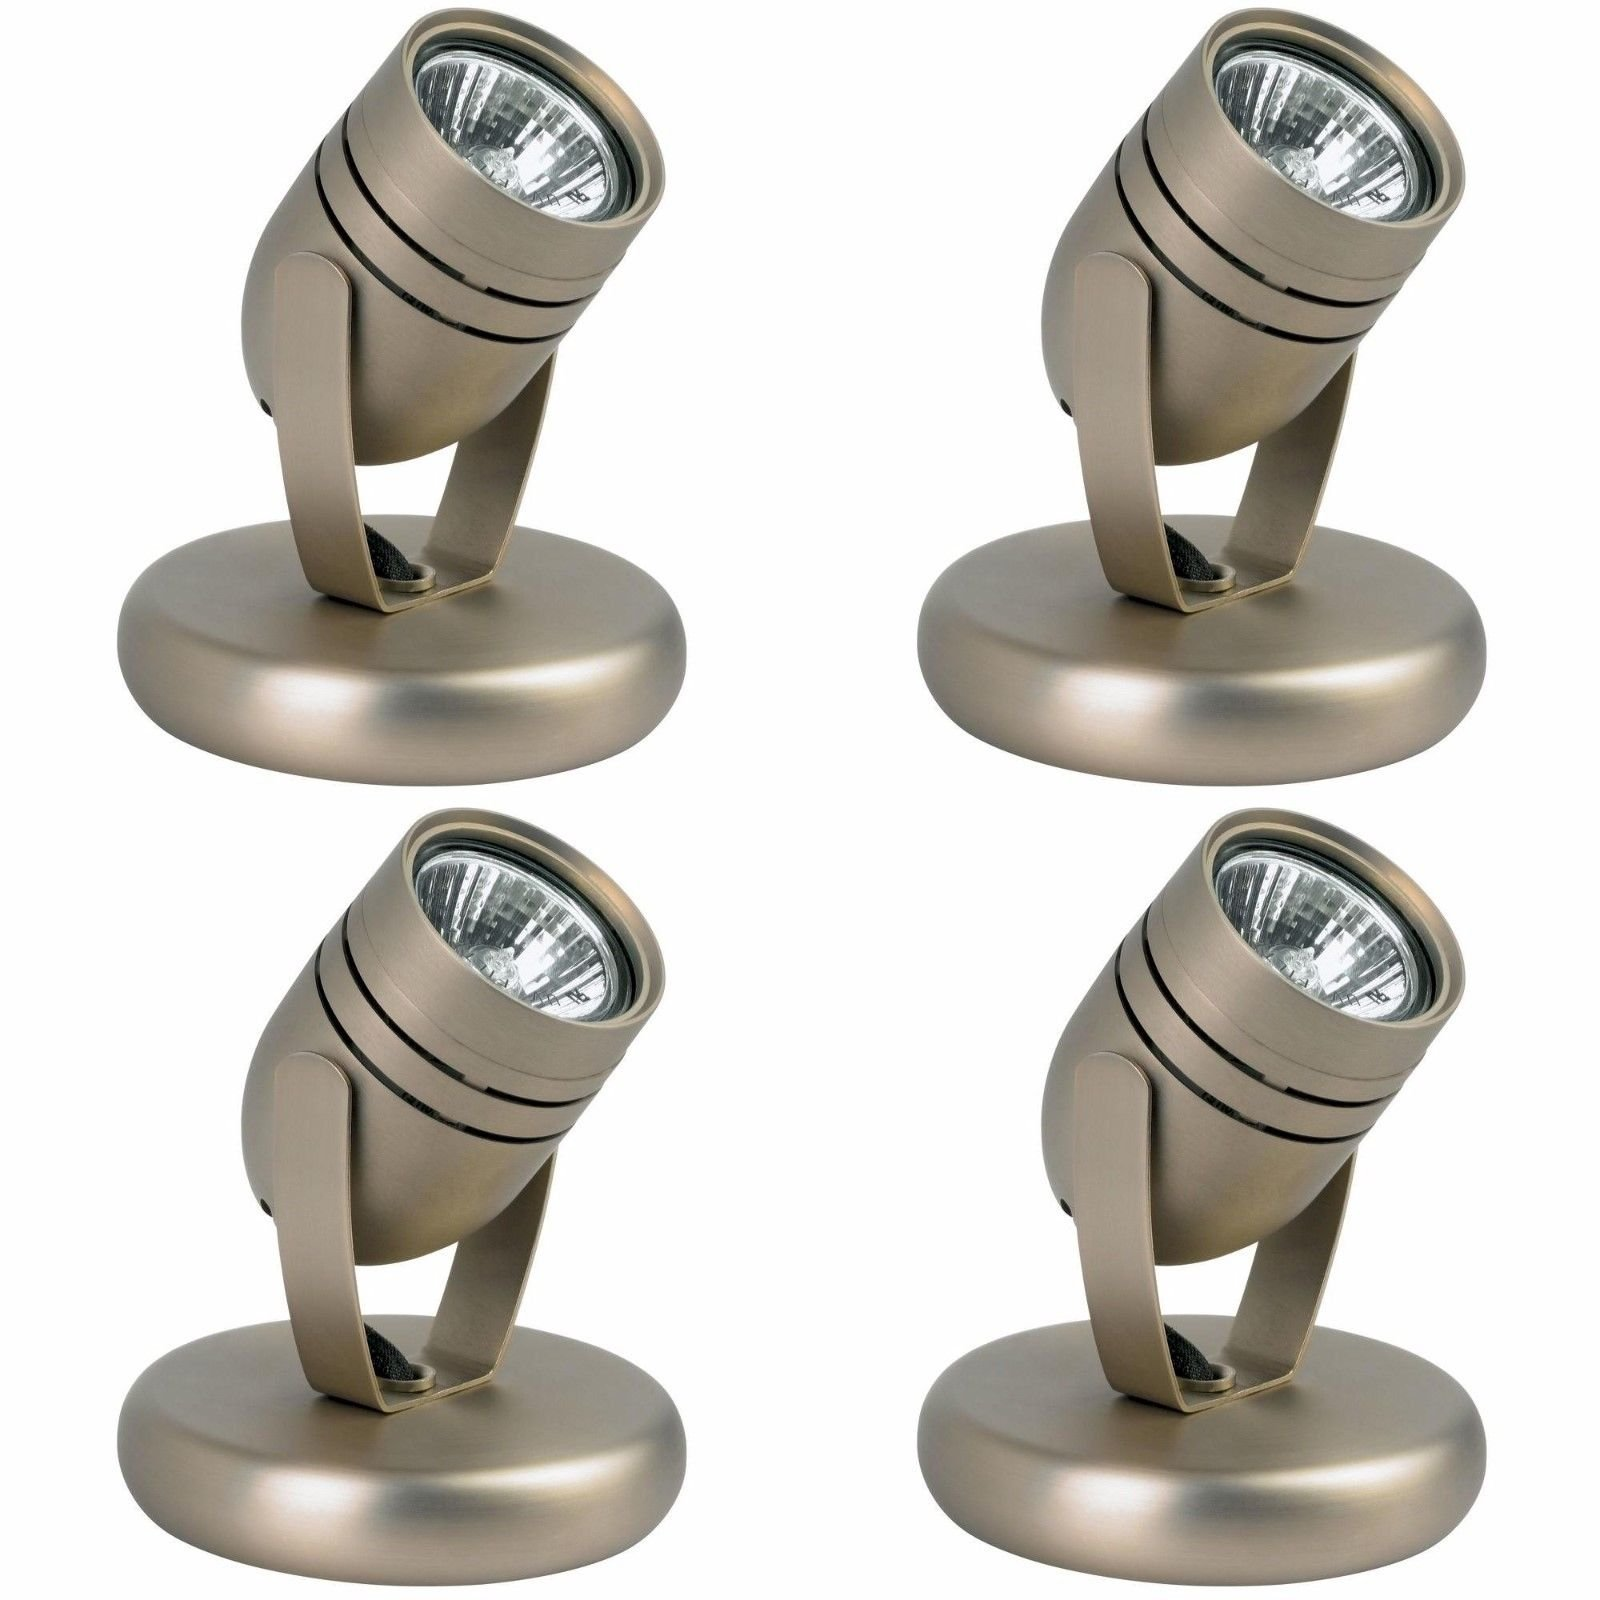 Slot Back Wall Uplight Light - Brushed Steel Nickel Finish - 5.12''h x 4.33''w -Model 585 880